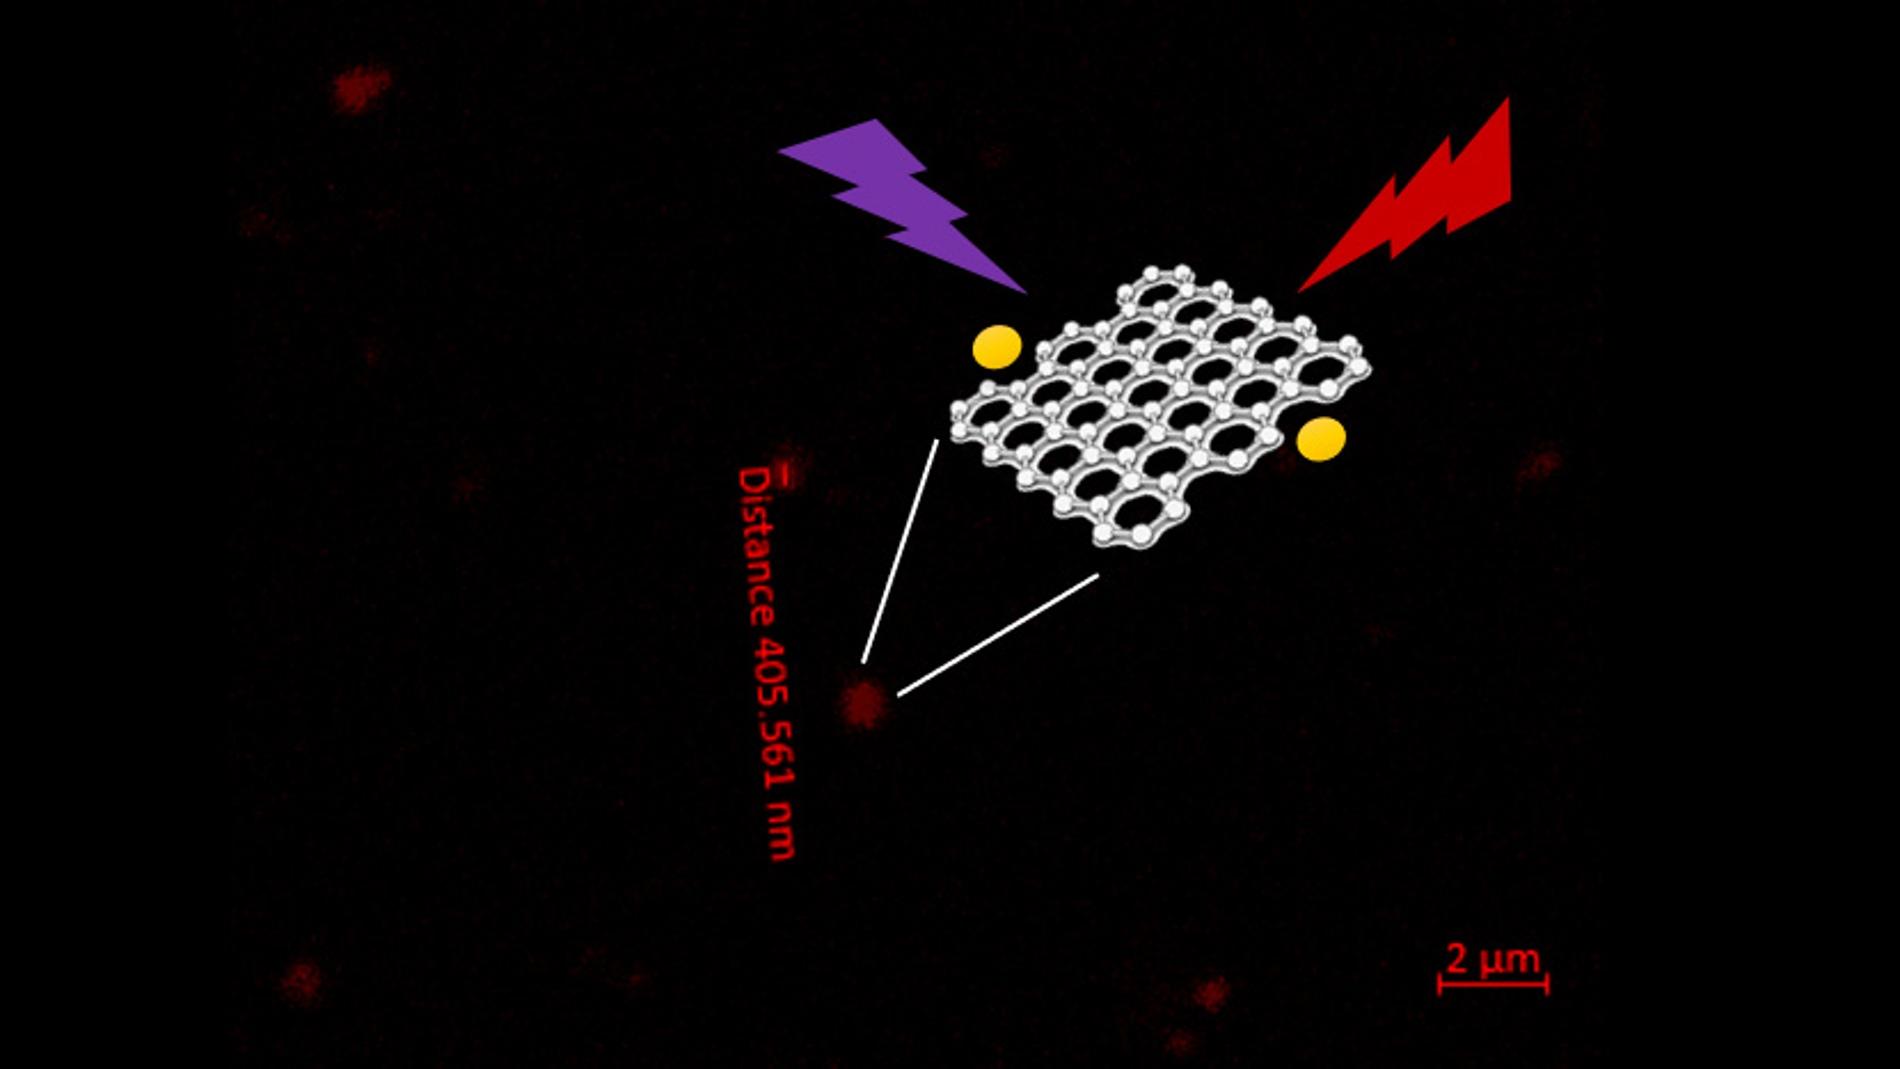 Como dotar de luminiscencia al grafeno